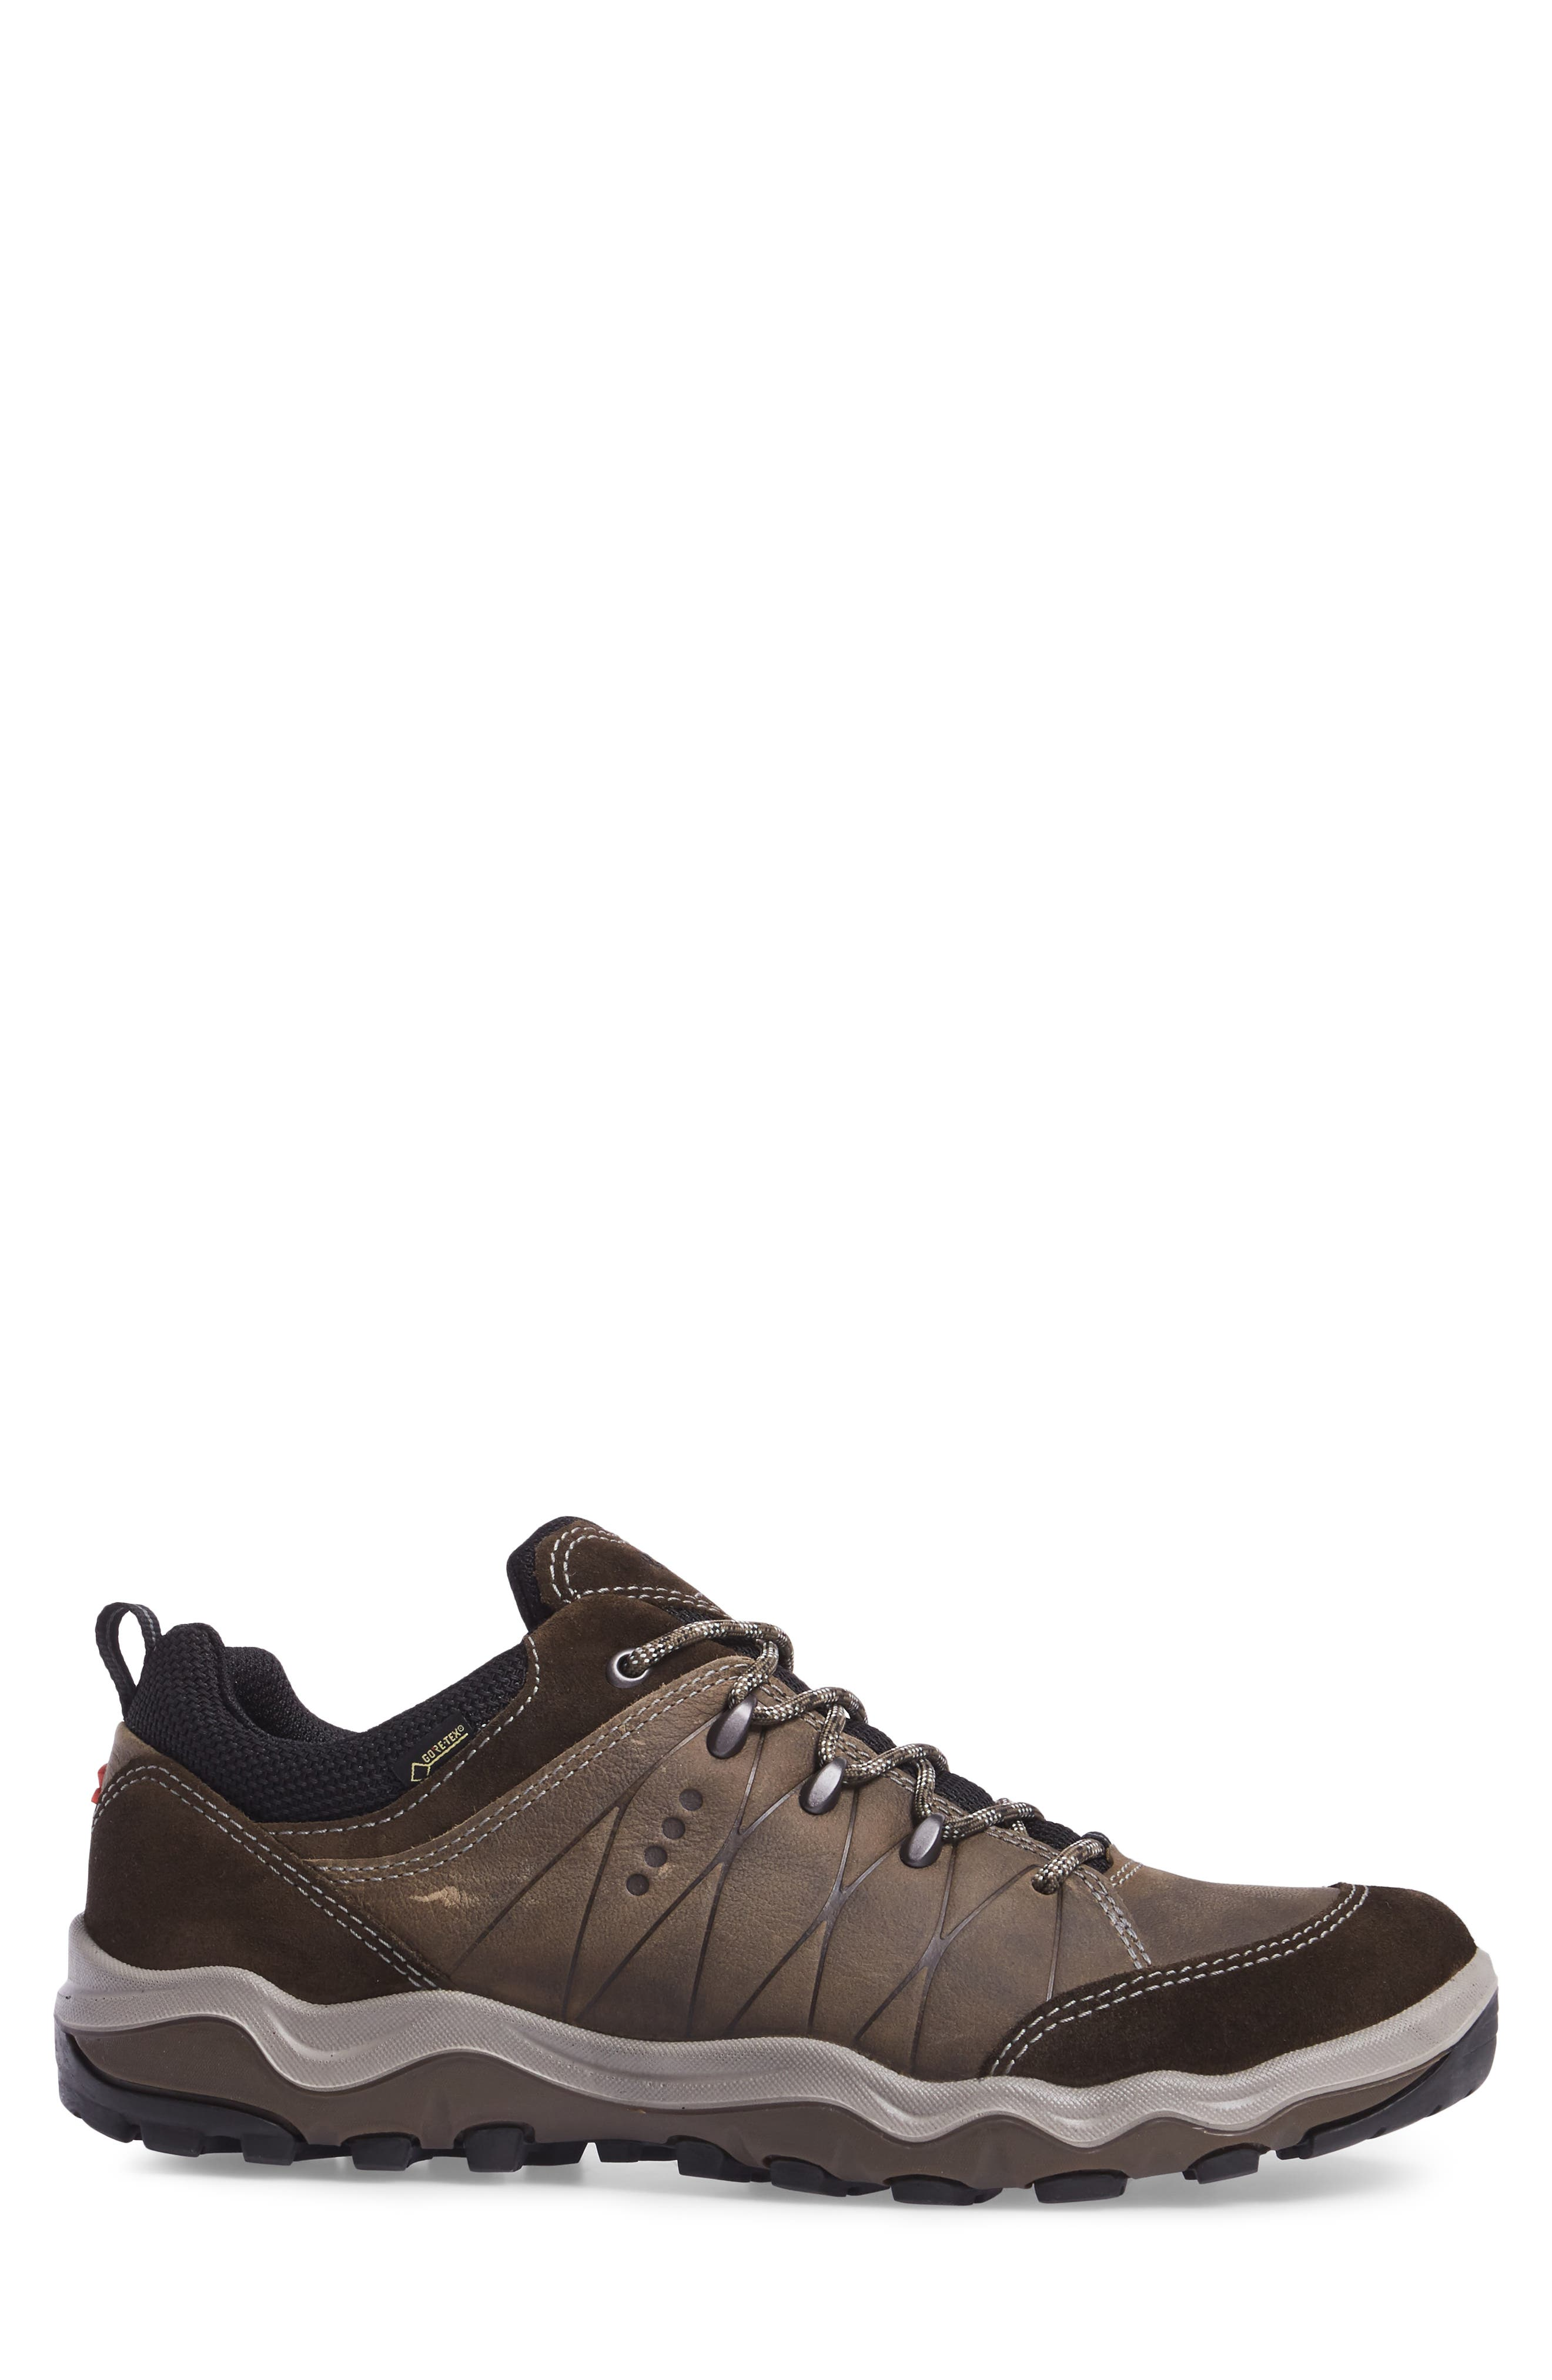 Ulterra GTX Sneaker,                             Alternate thumbnail 3, color,                             Tarmac Suede